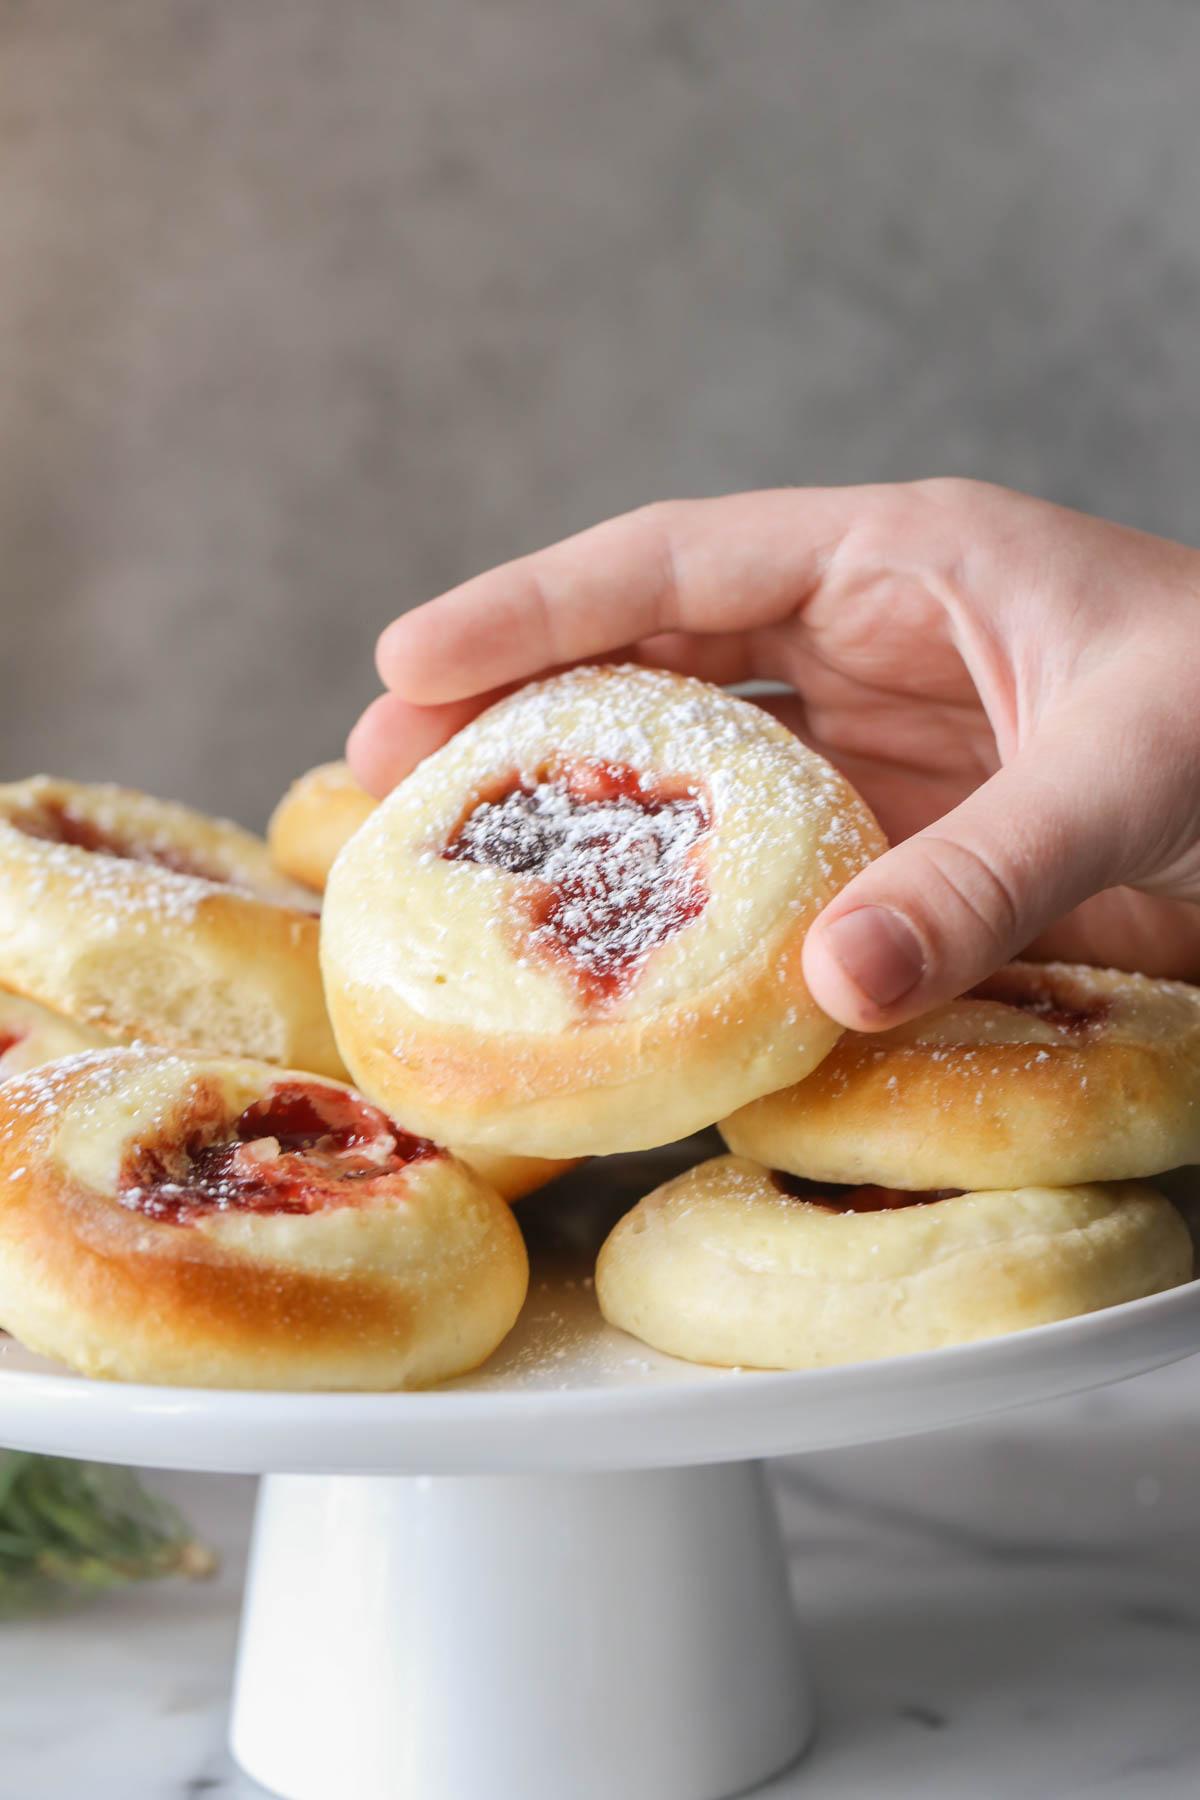 A hand grabbing a Raspberry Cream Cheese Kolache from the cake stand full of Raspberry Cream Cheese Kolaches.